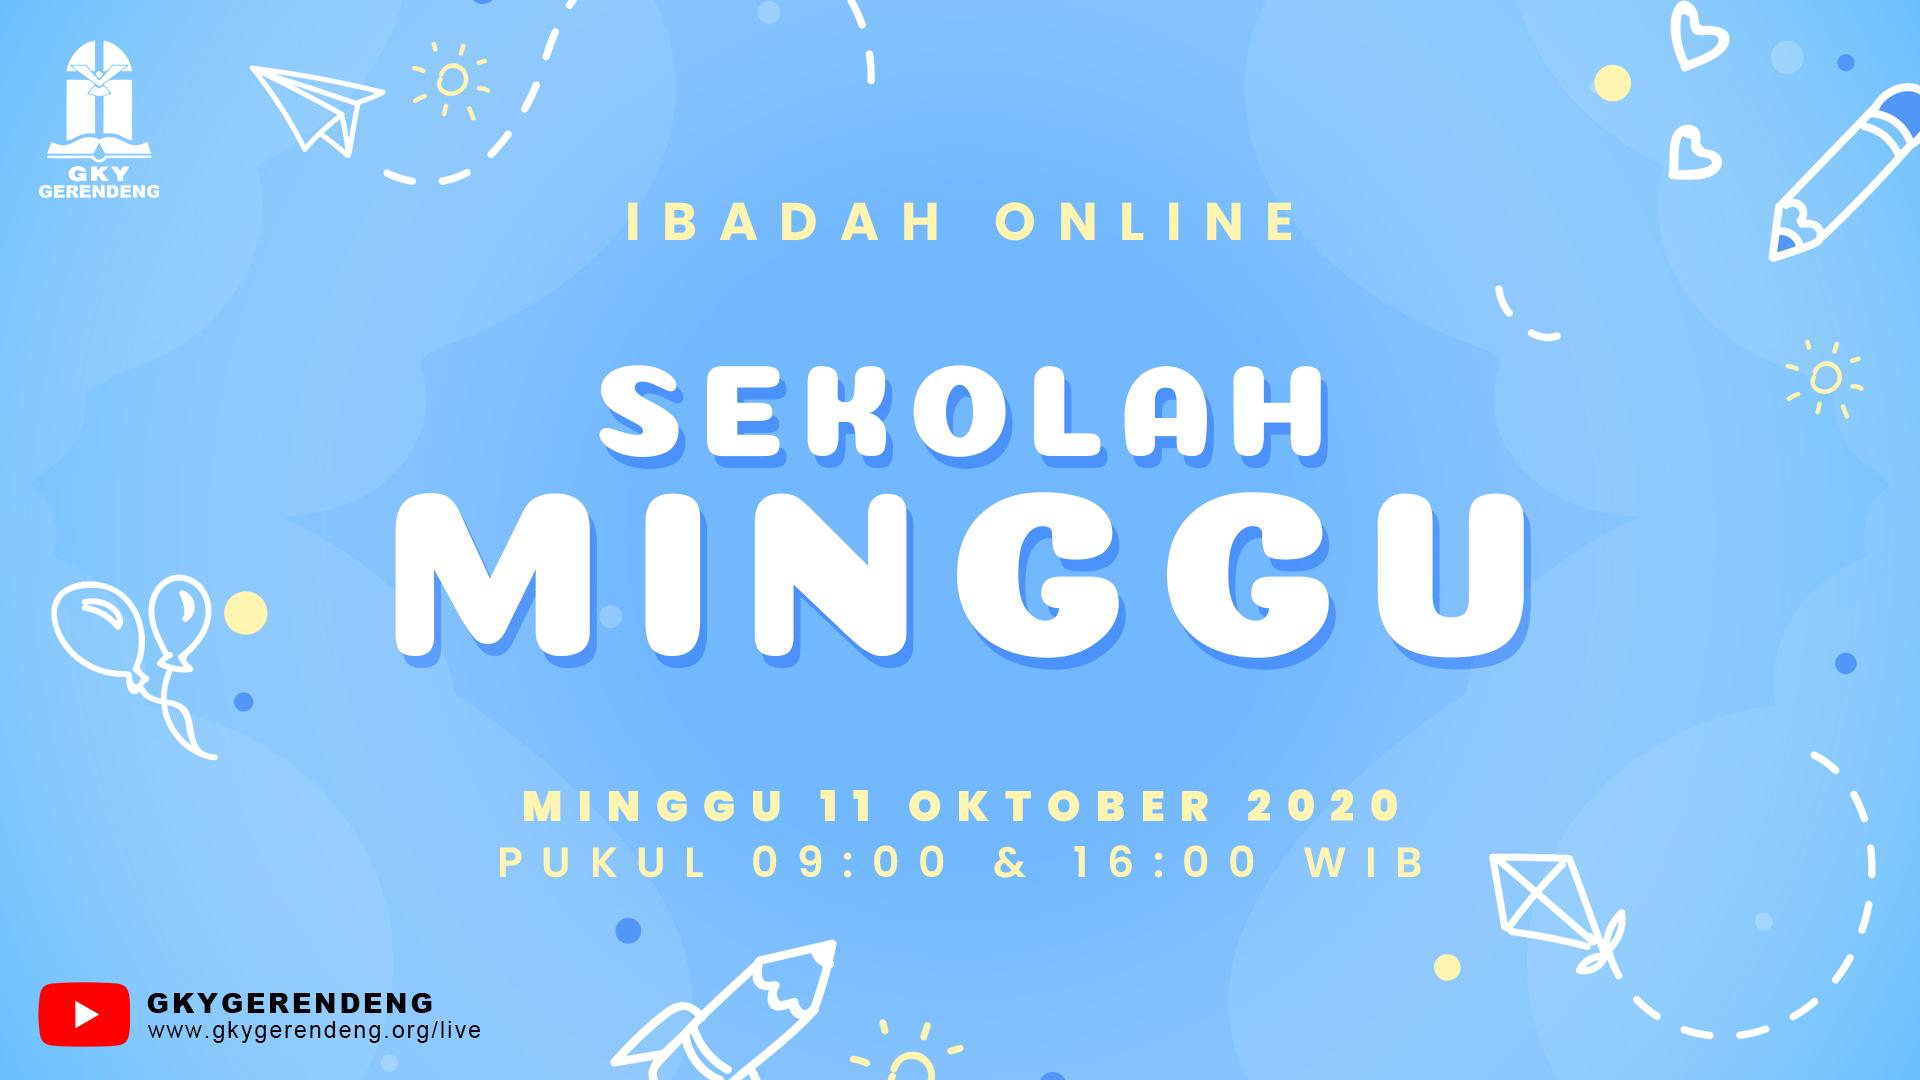 Ibadah Online Sekolah Minggu 11 Oktober 2020 GKY Gerendeng